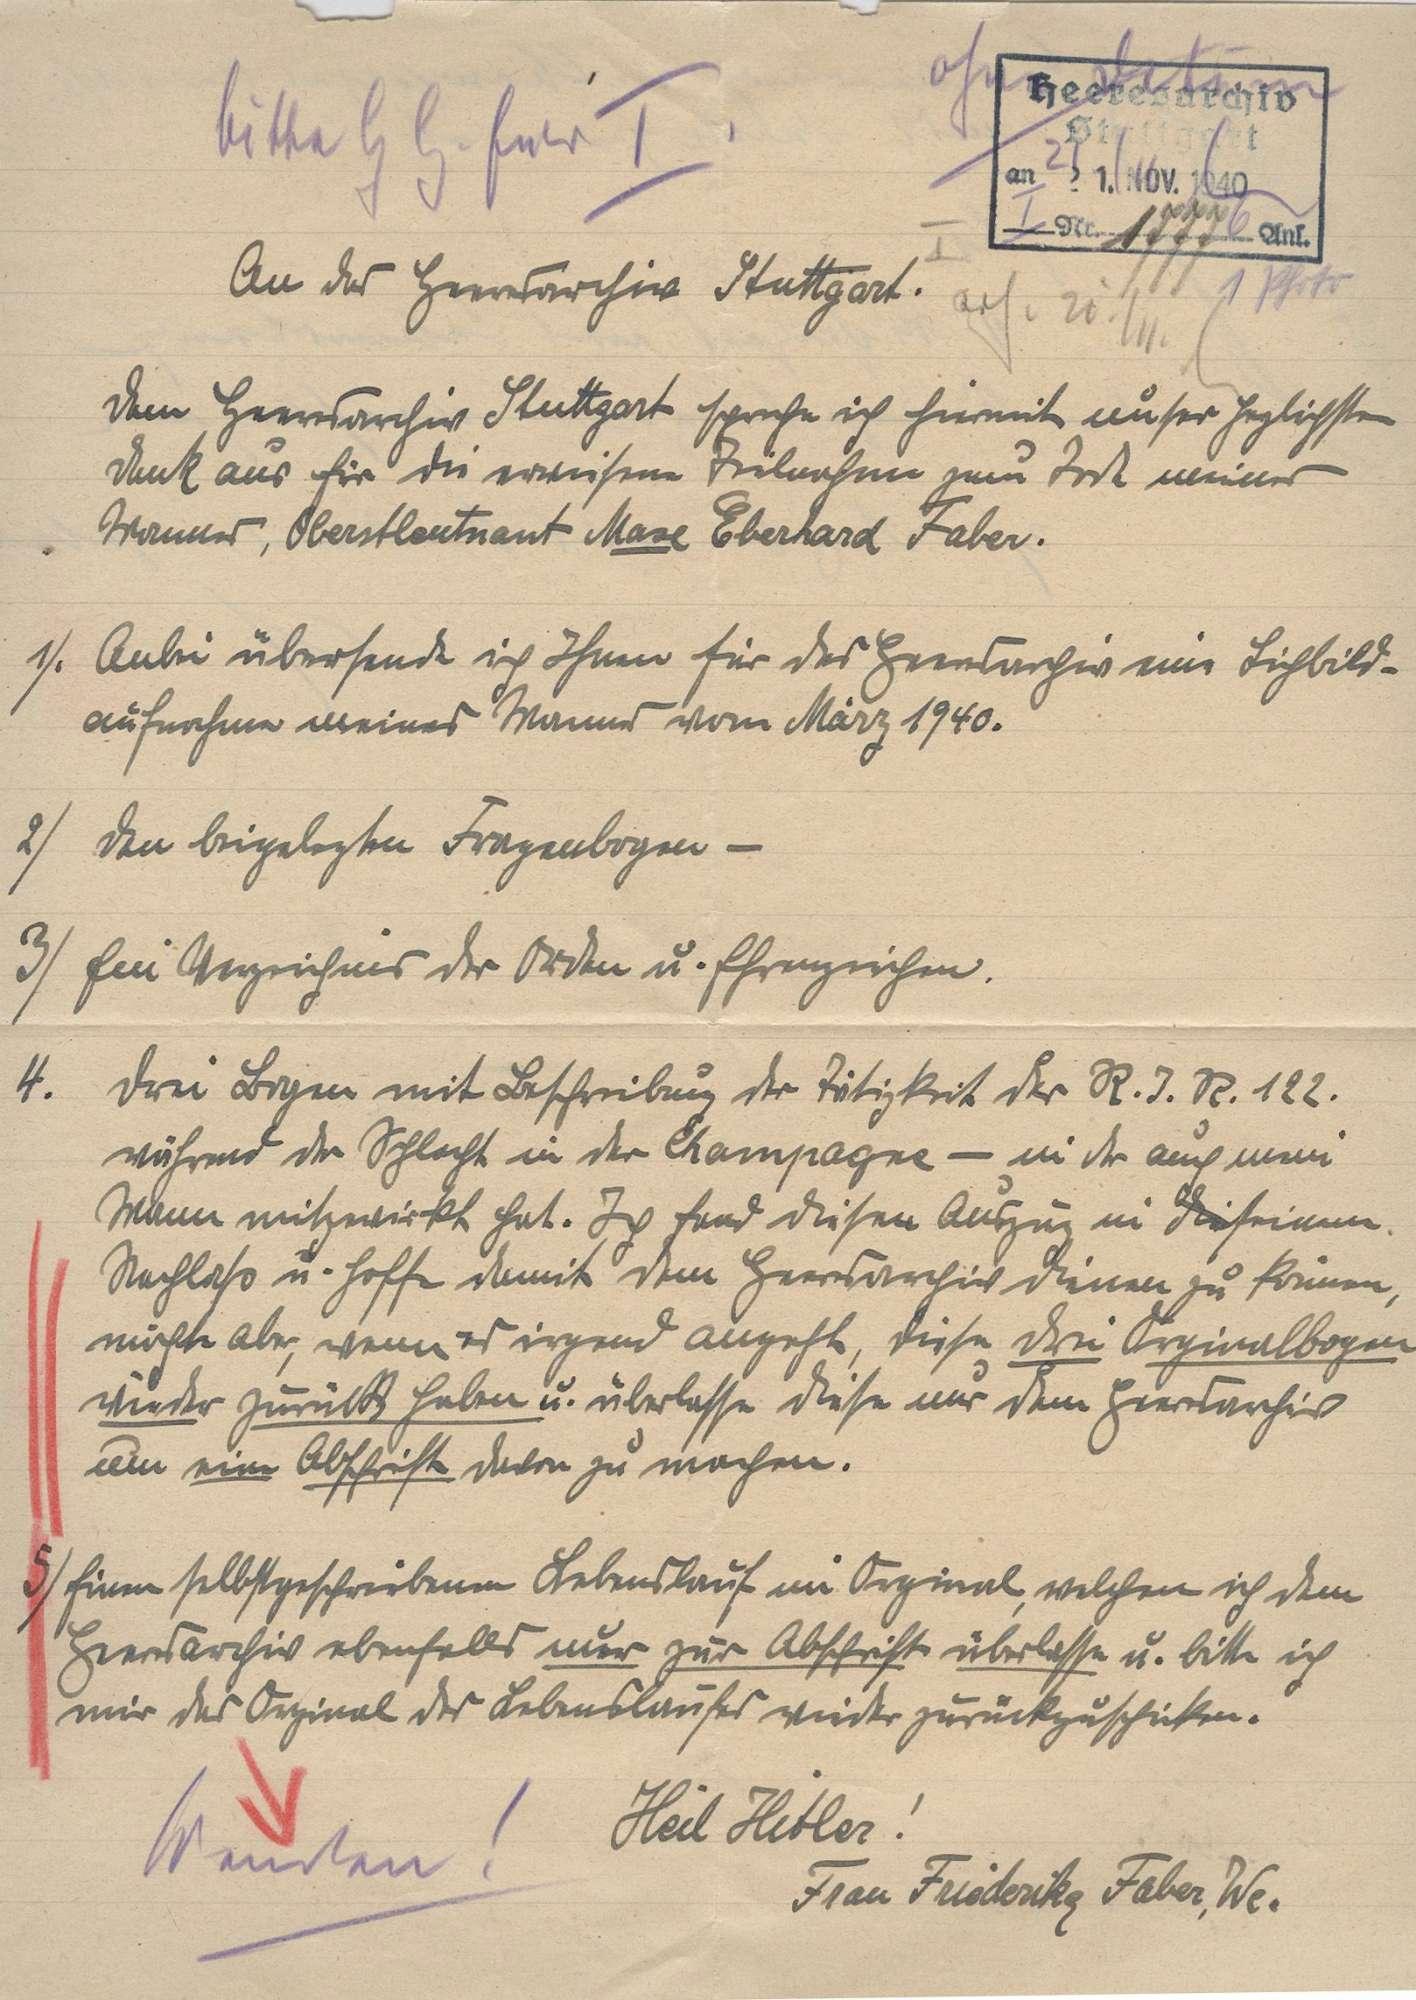 Faber, Max Eberhard, Bild 3